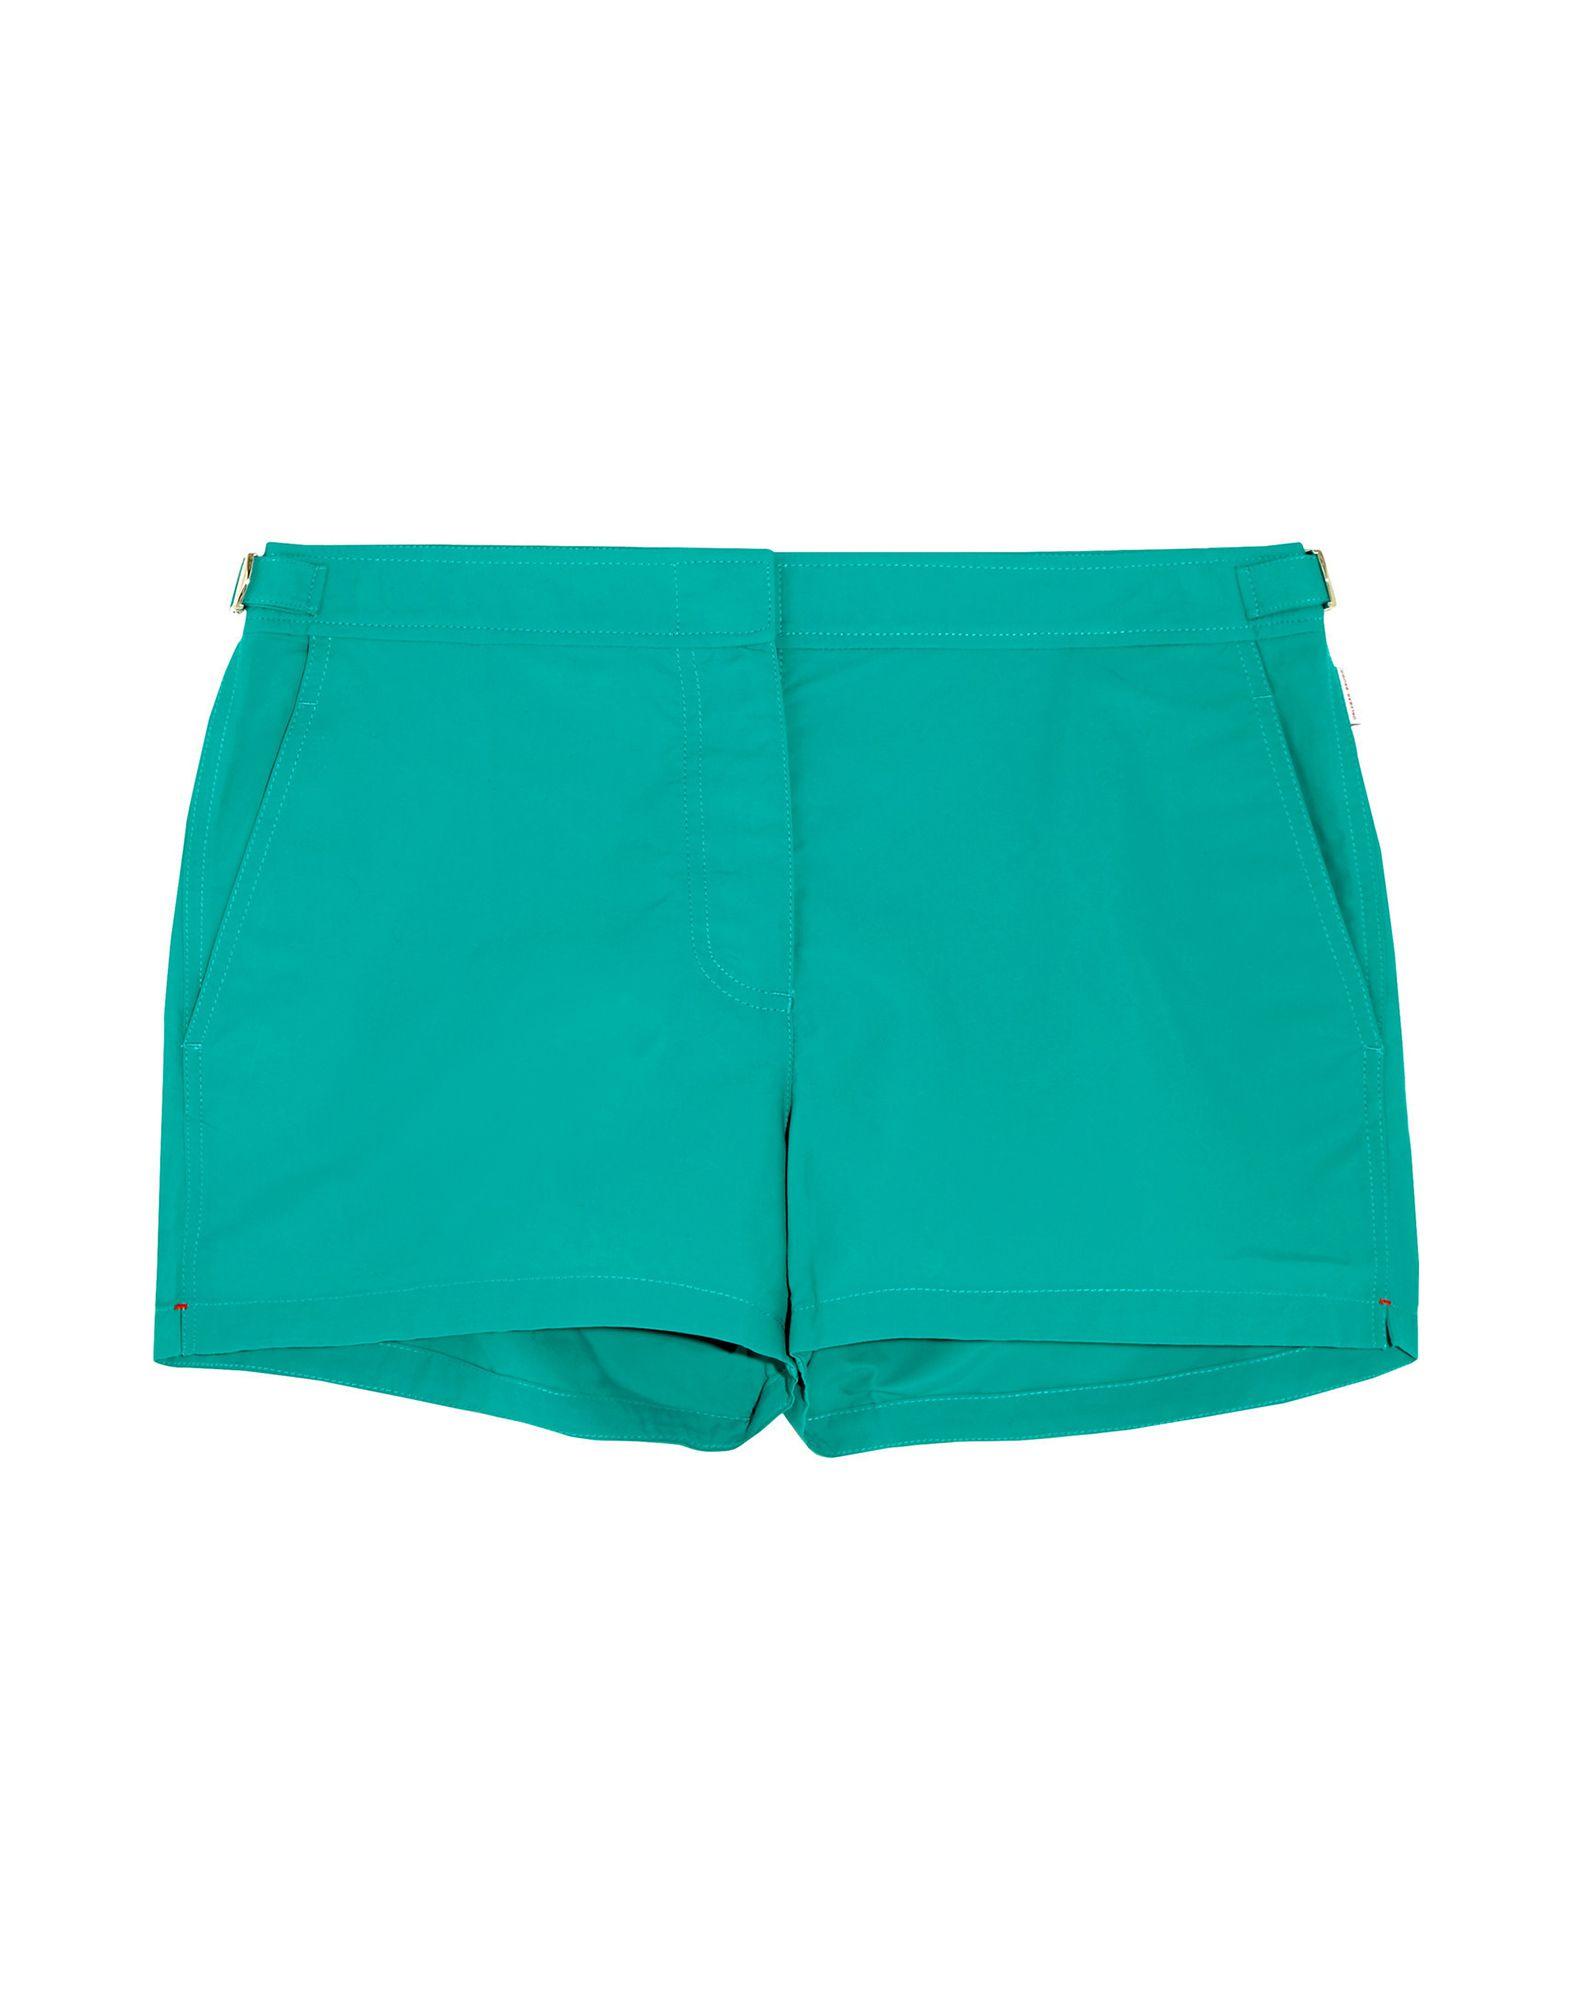 ORLEBAR BROWN Пляжные брюки и шорты versace пляжные брюки и шорты